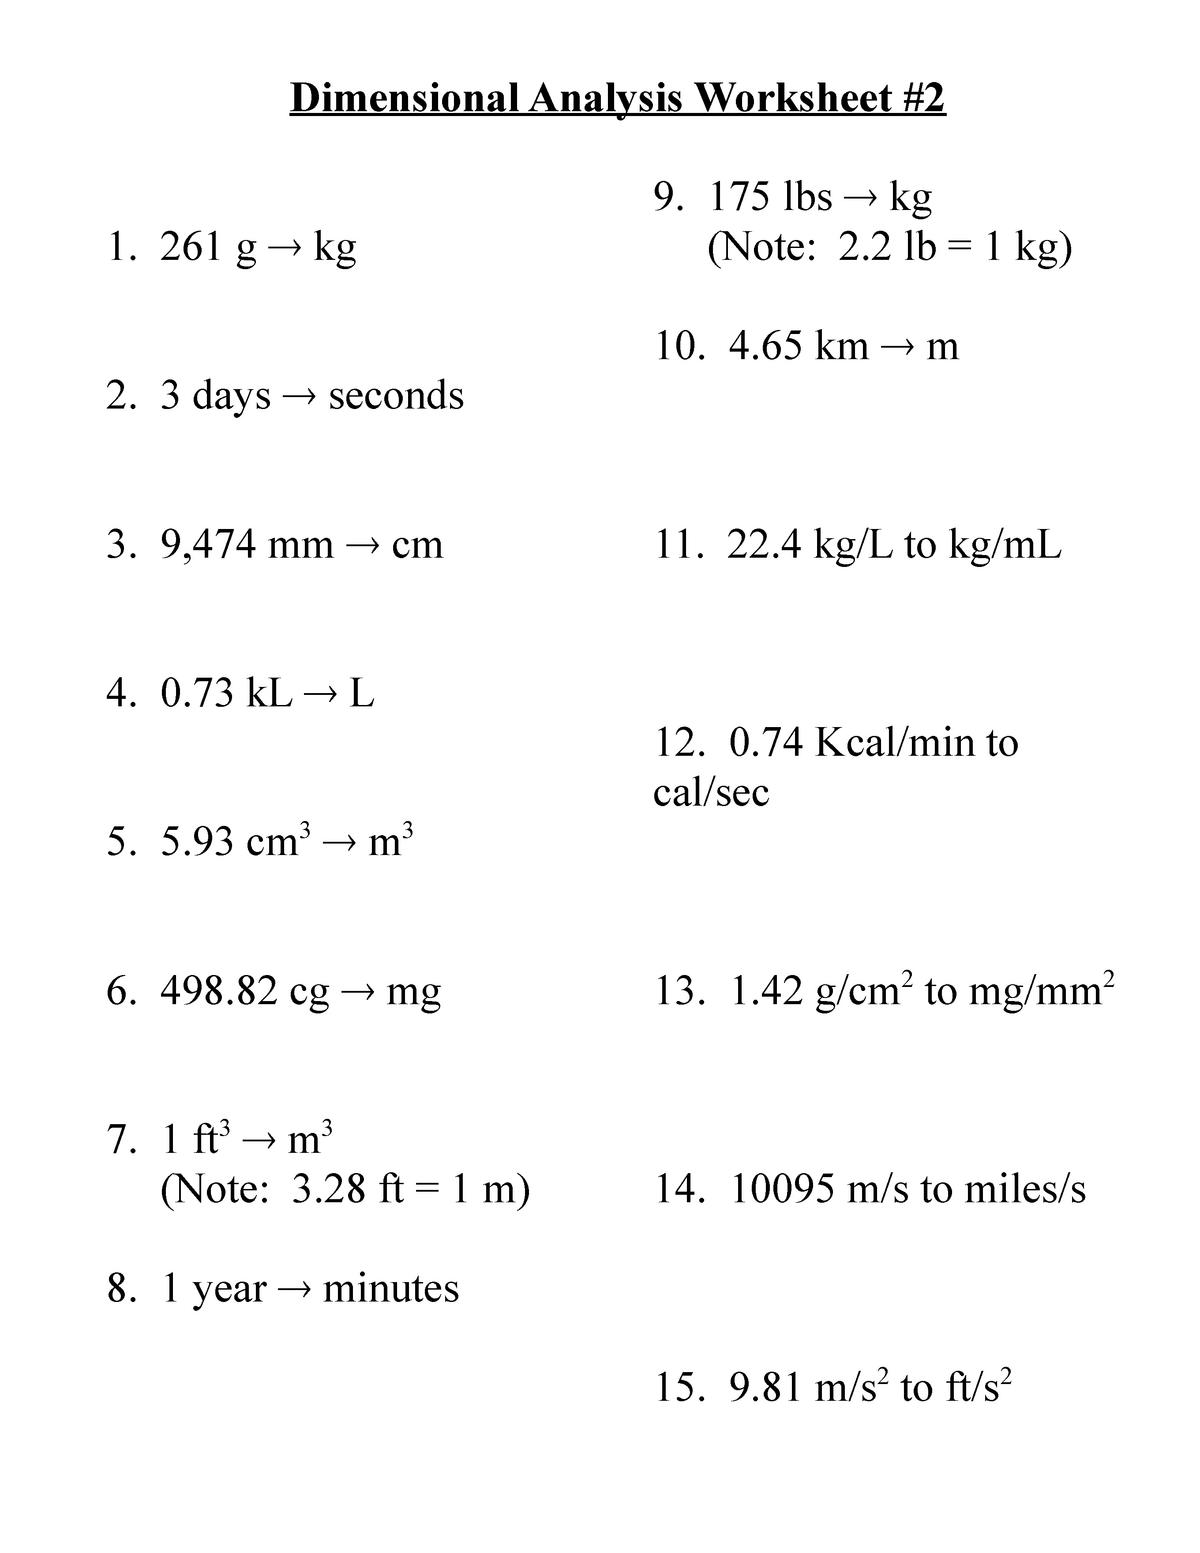 Dimensional analysis worksheet - CHEM 22 - Organic Chemistry I In Dimensional Analysis Practice Worksheet